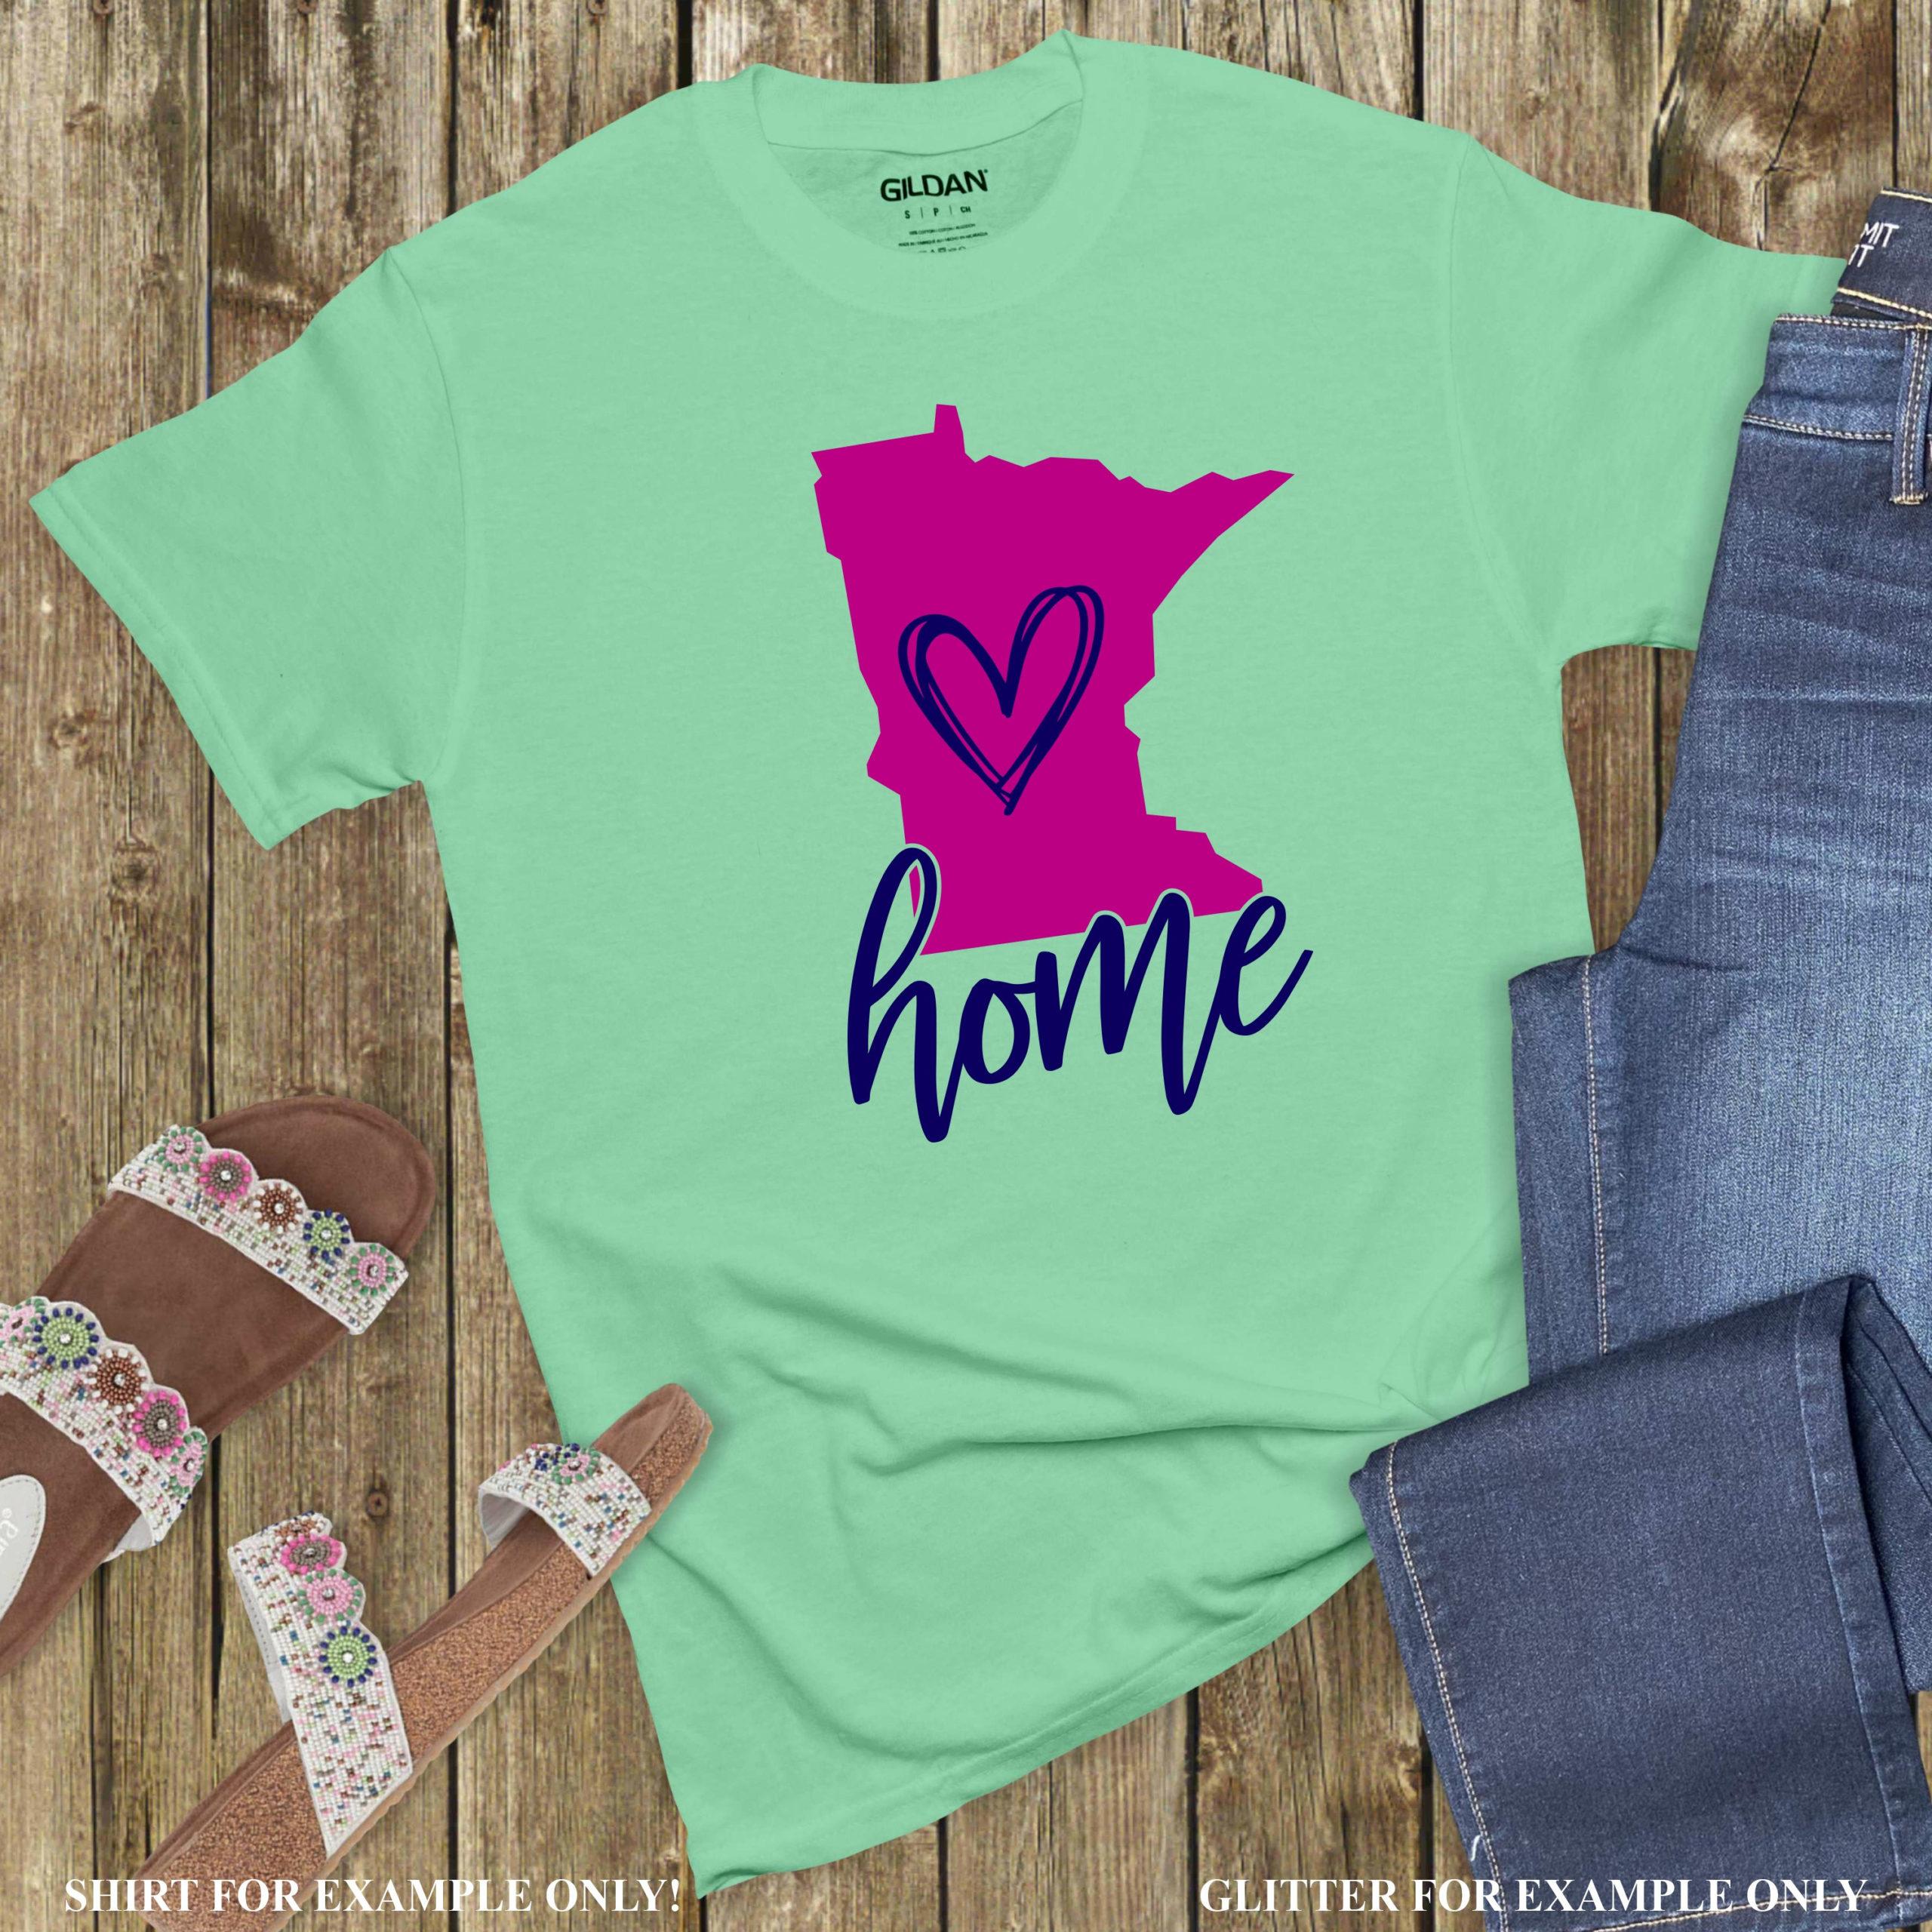 Minnesota-svg-state-svg-home-state-svg-home-svg-state-home-svg-cuttable-svg-designs-cuttable-cut-file-cricut-svg-6051311f